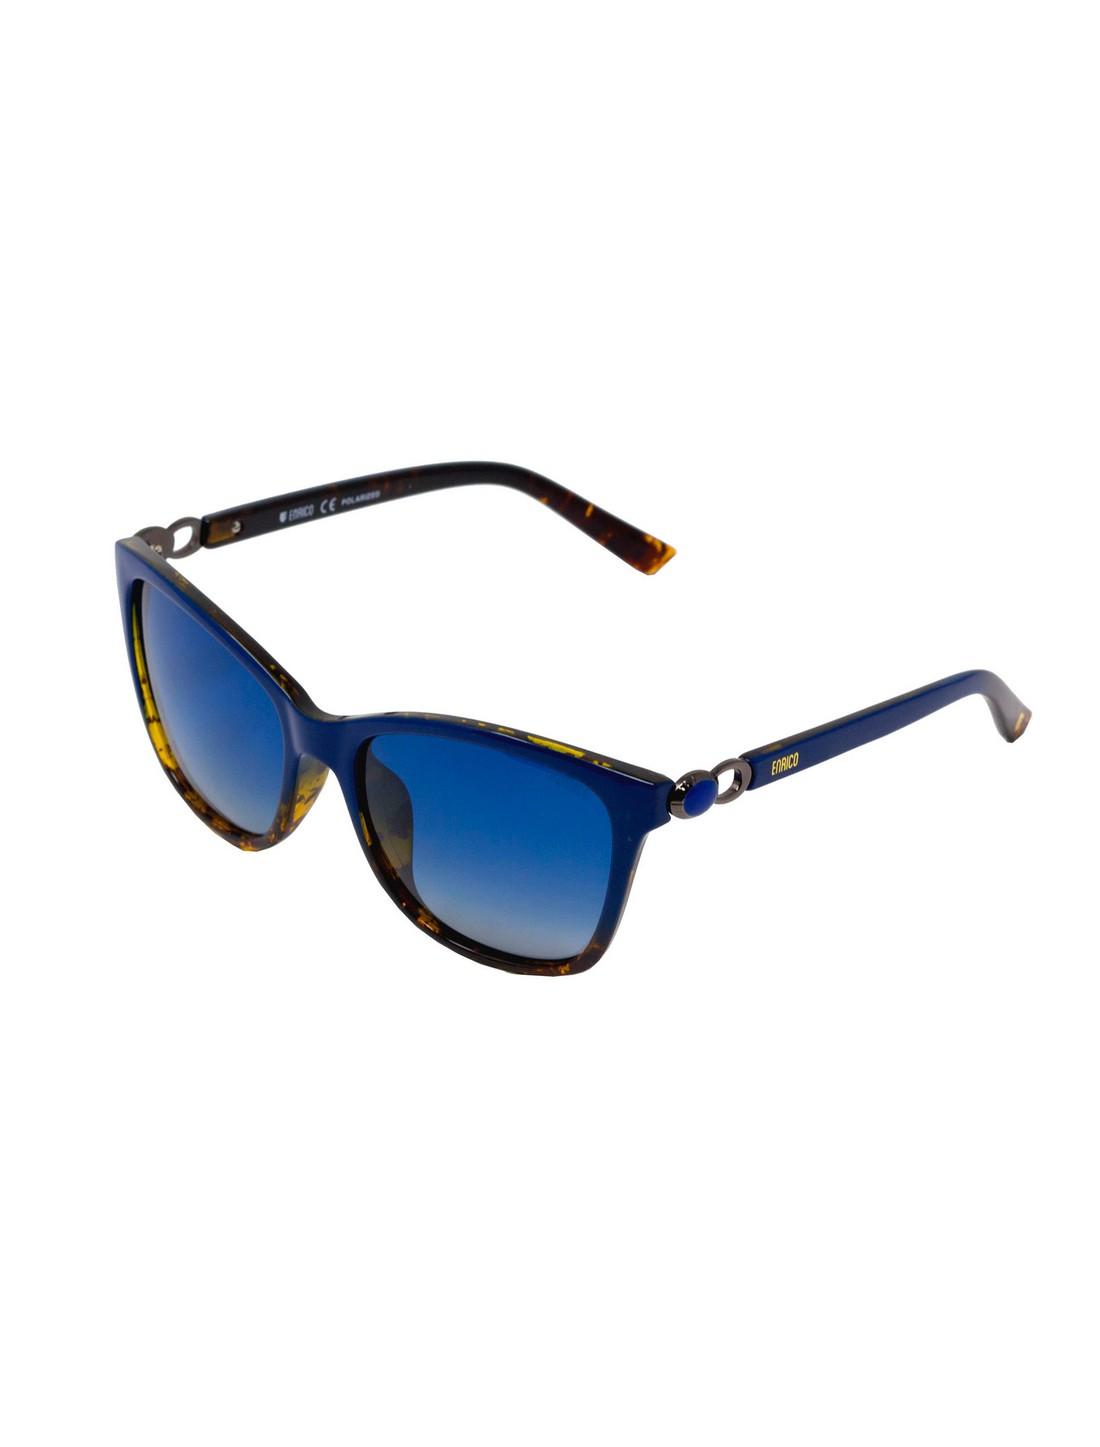 ENRICO   ENRICO Luna Polycarbonate UV Protected Cateye Sunglasses for Women ( Lens - Blue   Frame - Blue)